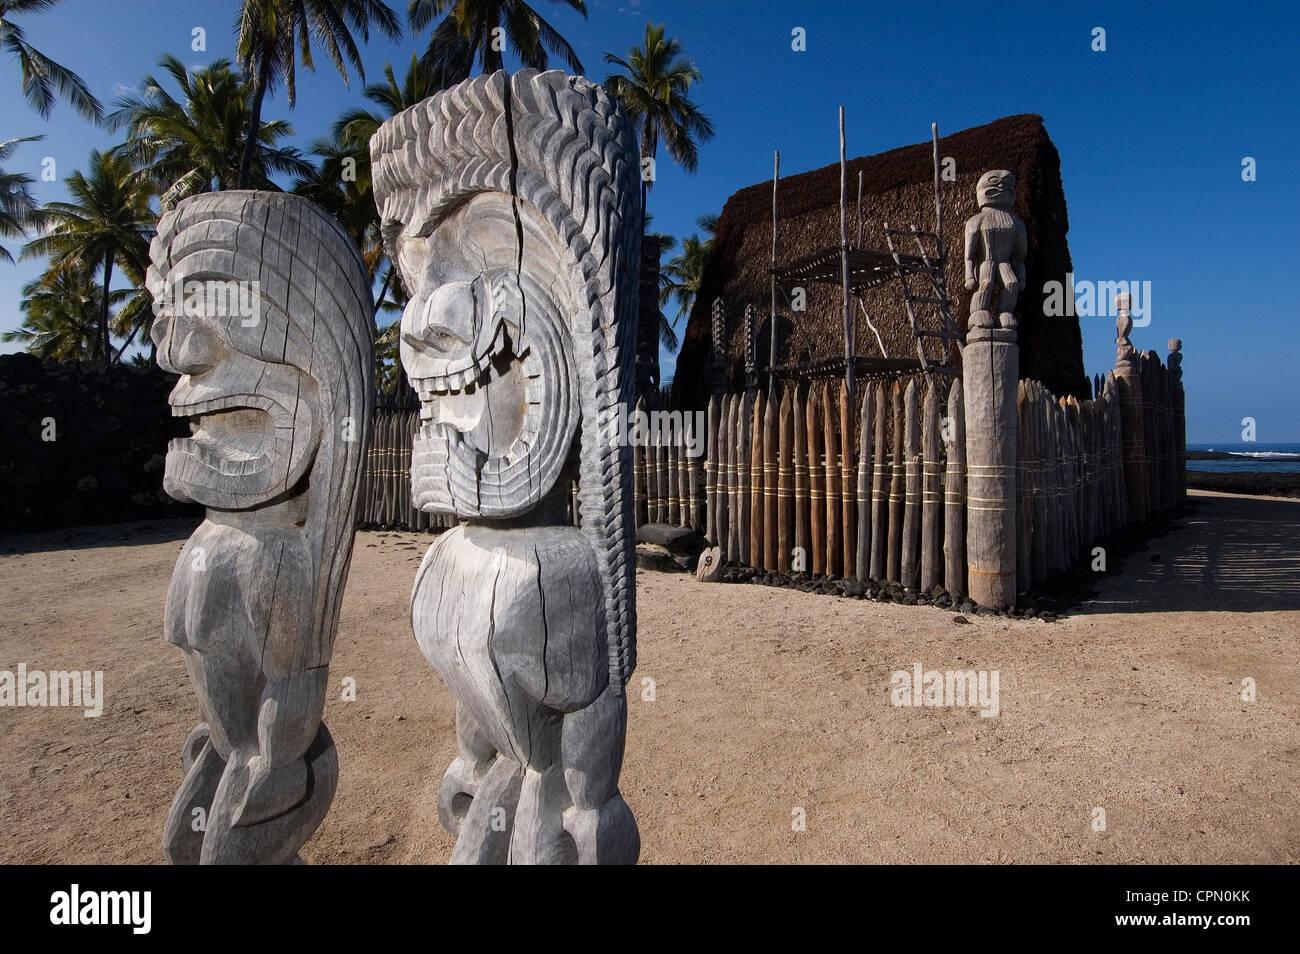 Elk284-3081 Hawaii, HI, Pu'uhonua O Honaunau NHP, Place of Refuge, kii figures - Stock Image